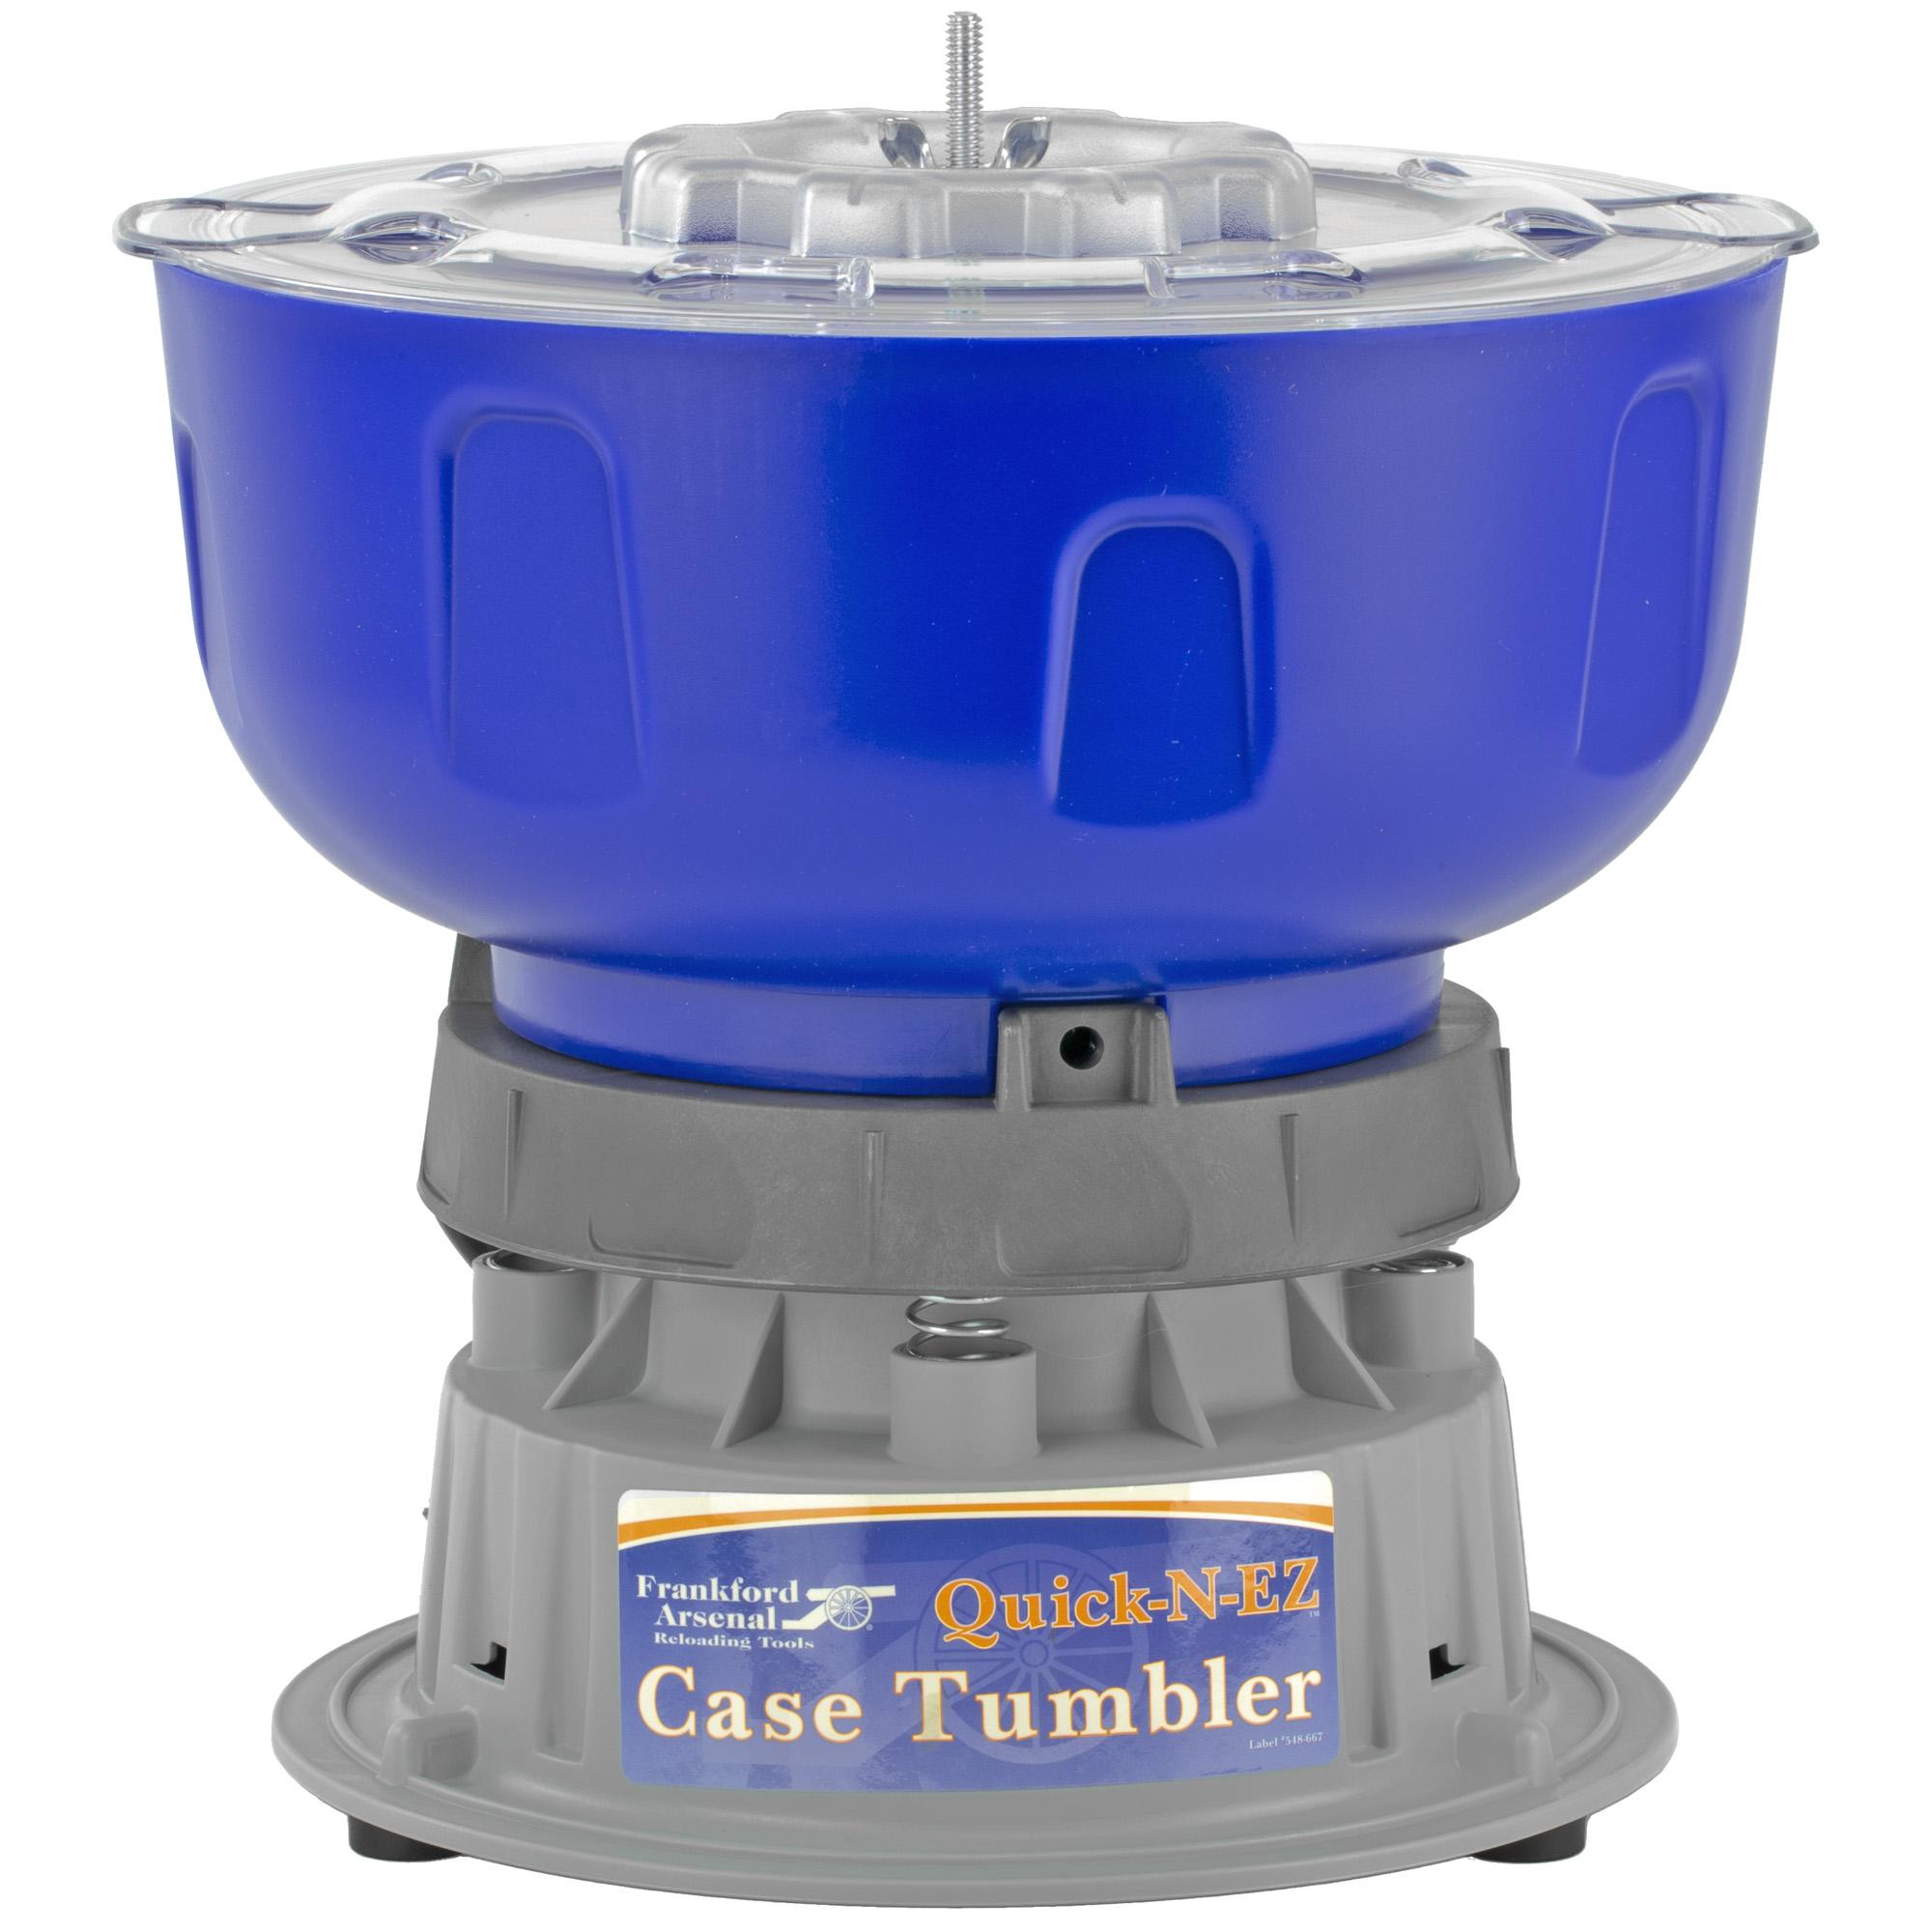 Frankford Case Tumbler 110v